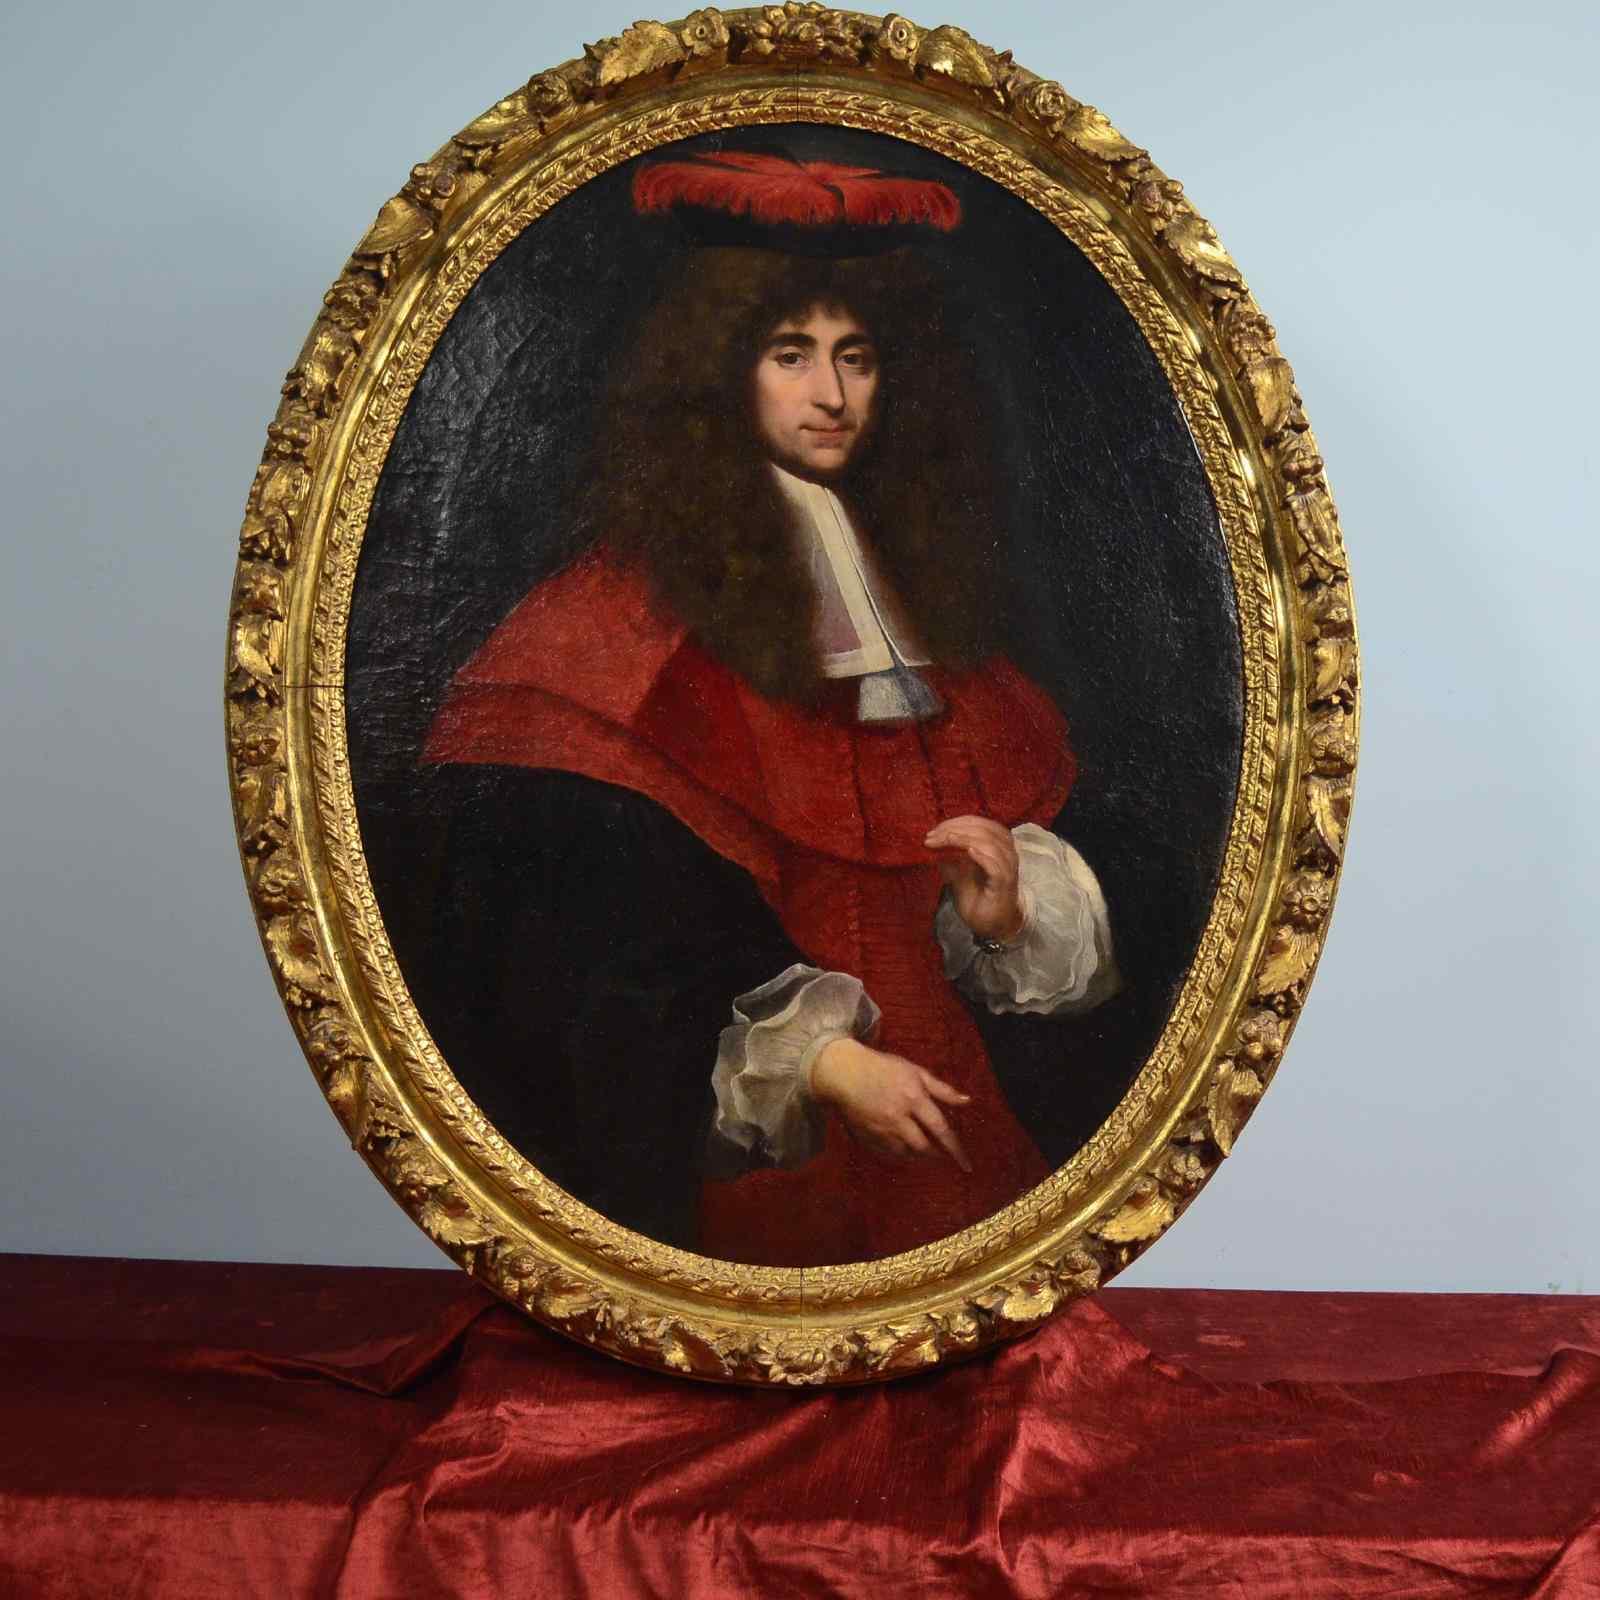 XVIIth Century Portrait, Jean de TROY 1638 - 1691